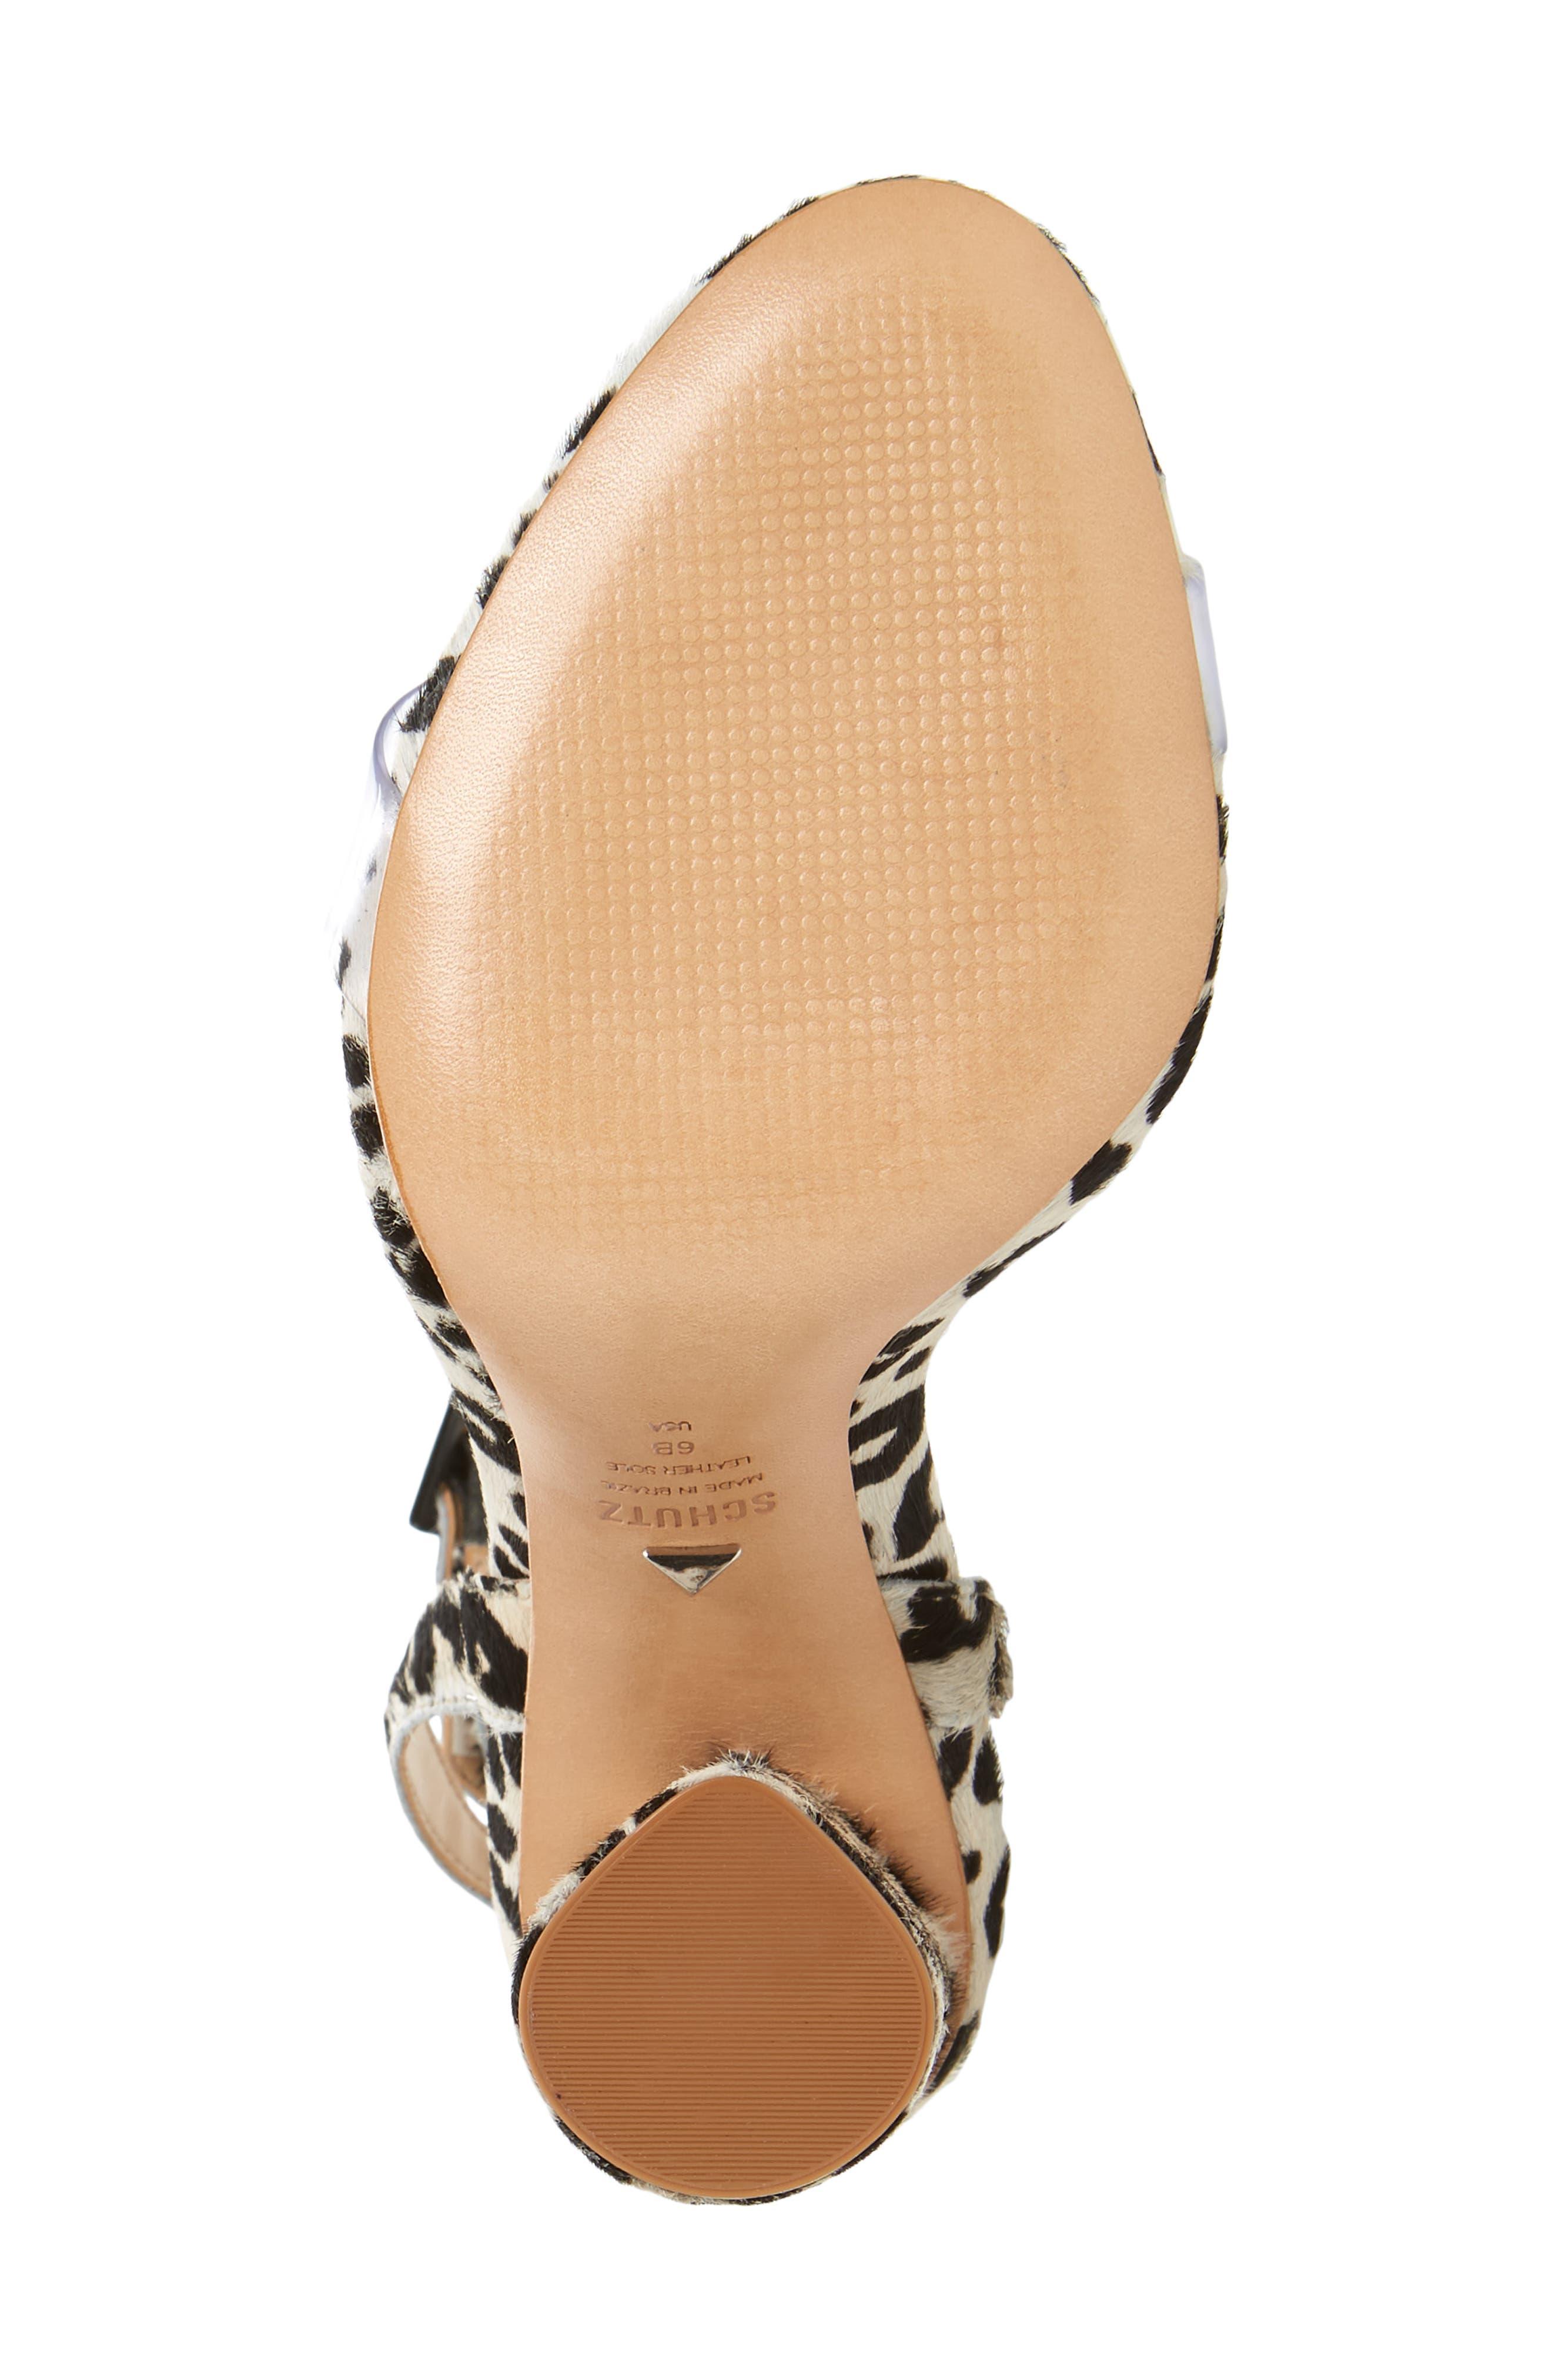 Elenita Genuine Calf Hair Sandal,                             Alternate thumbnail 6, color,                             PEARL CALF HAIR